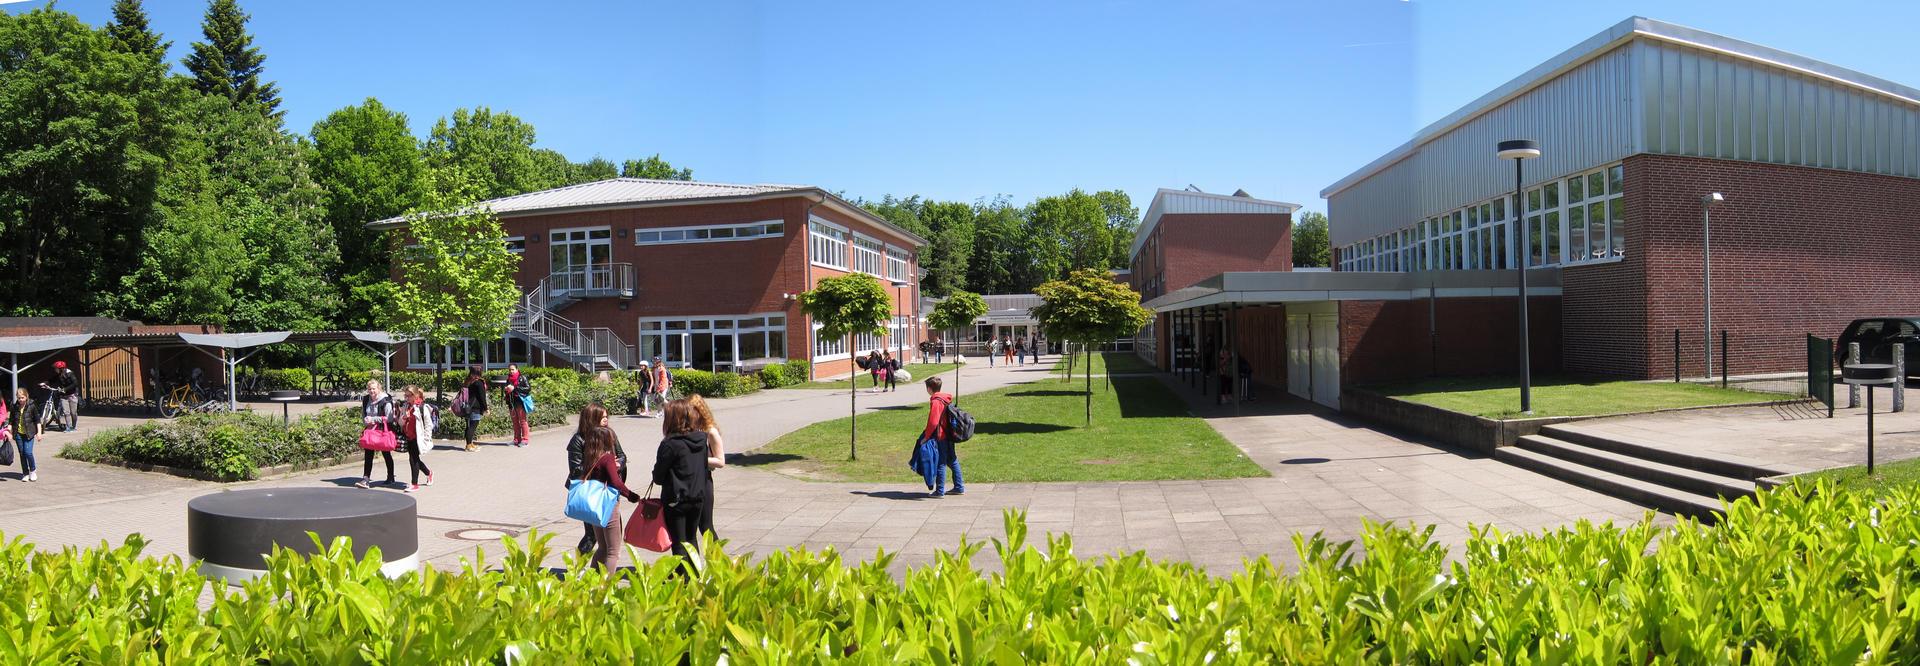 Gebäude Realschule